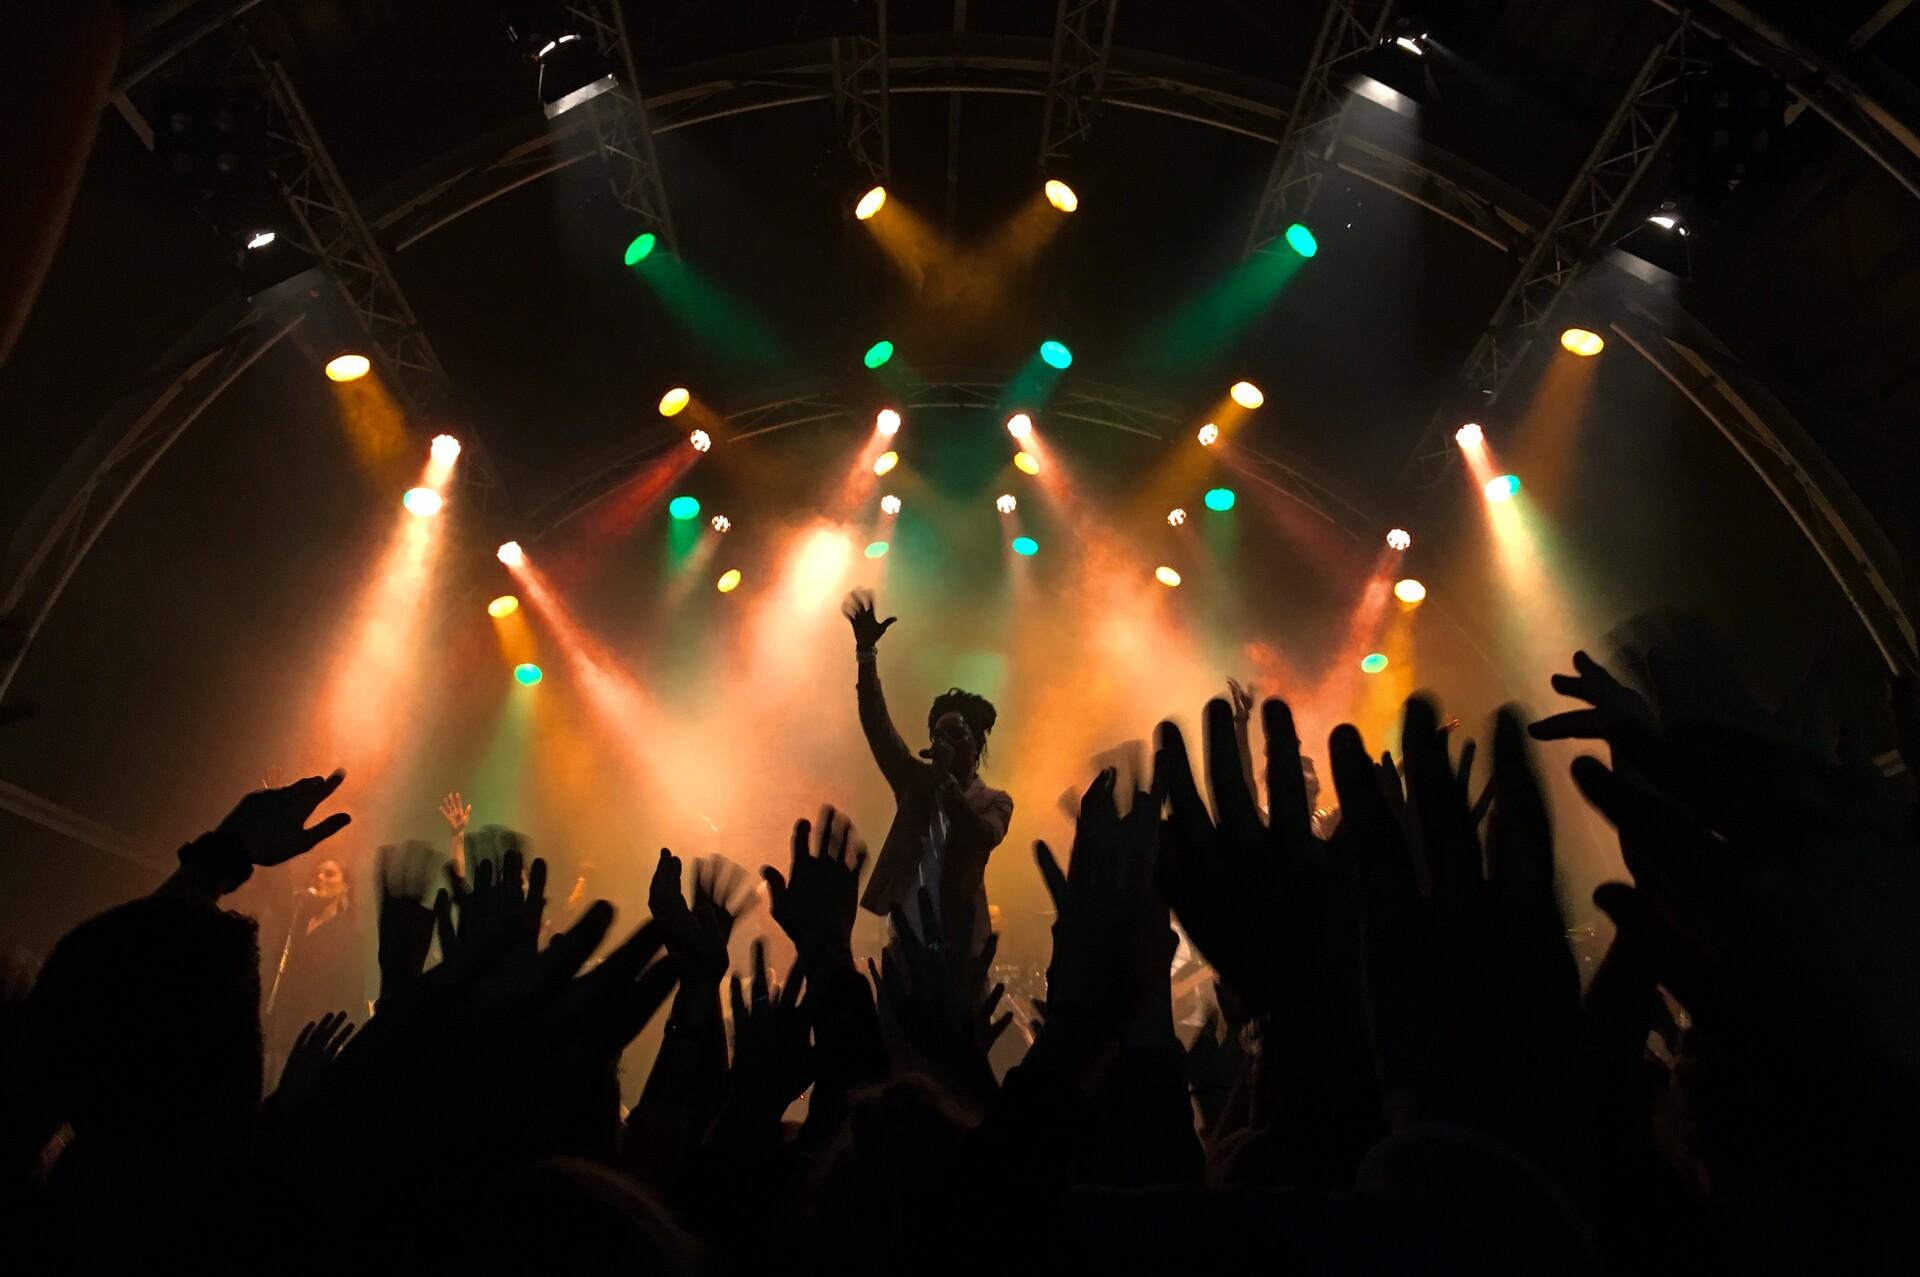 Festival a Exeter - Festival ed eventi a Exeter e a Sud Ovest